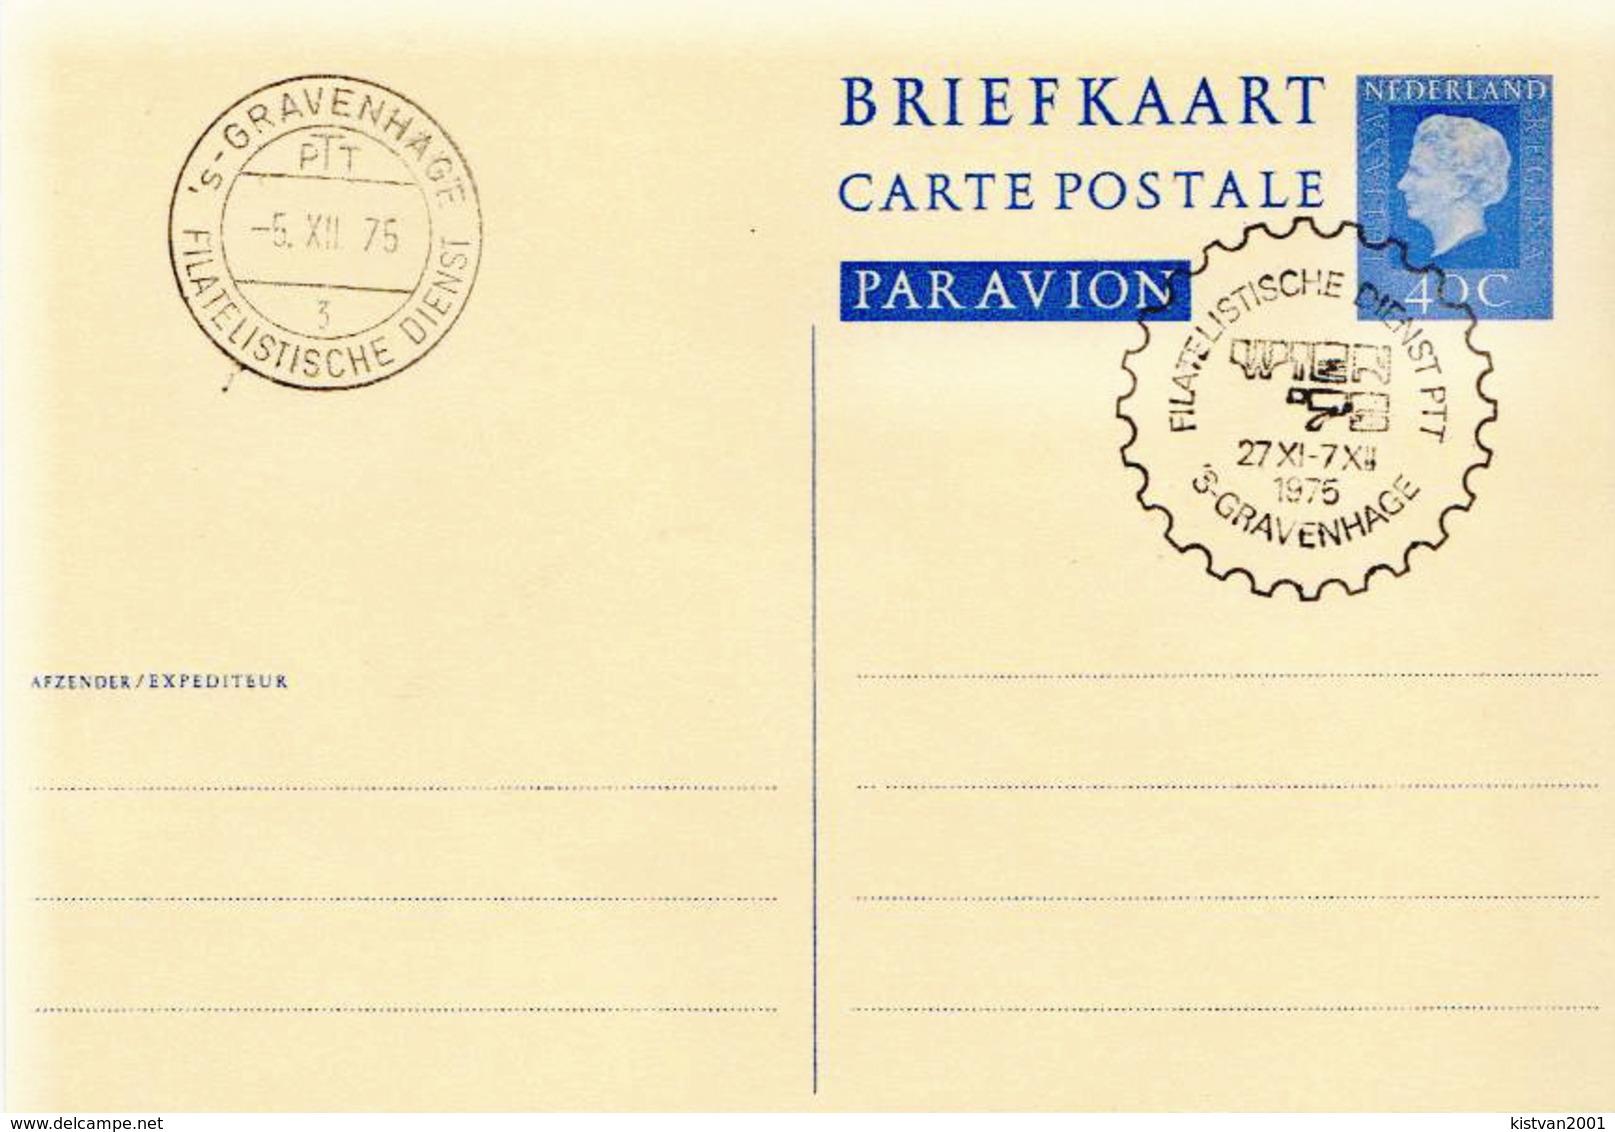 Netherlands Postal Stationery Card - Postal Stationery